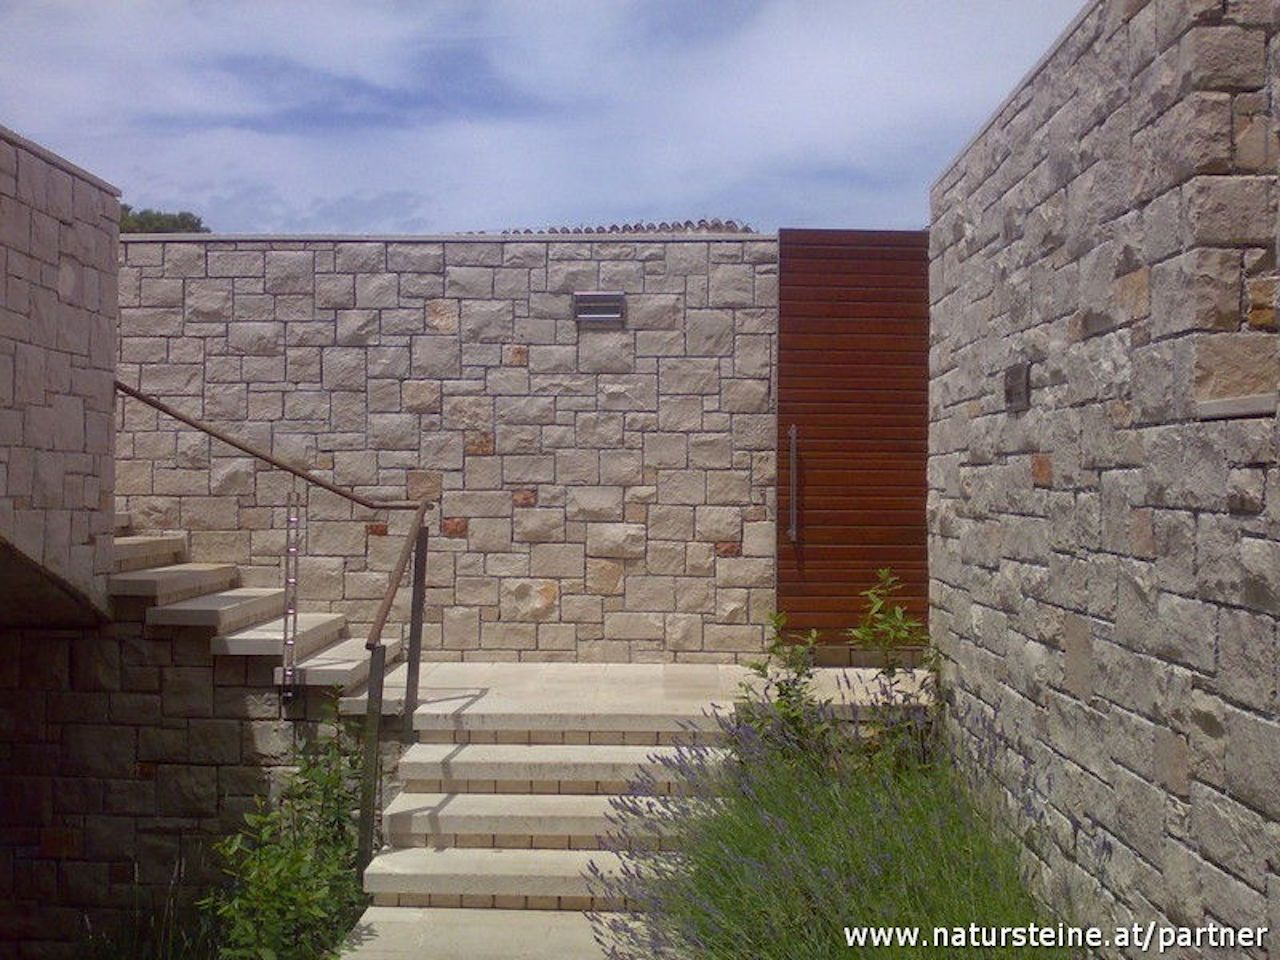 Wandverkleidung Verblender Fur Den Aussenbereich In 2020 Wandverkleidung Aussen Wandverkleidung Steinfassade